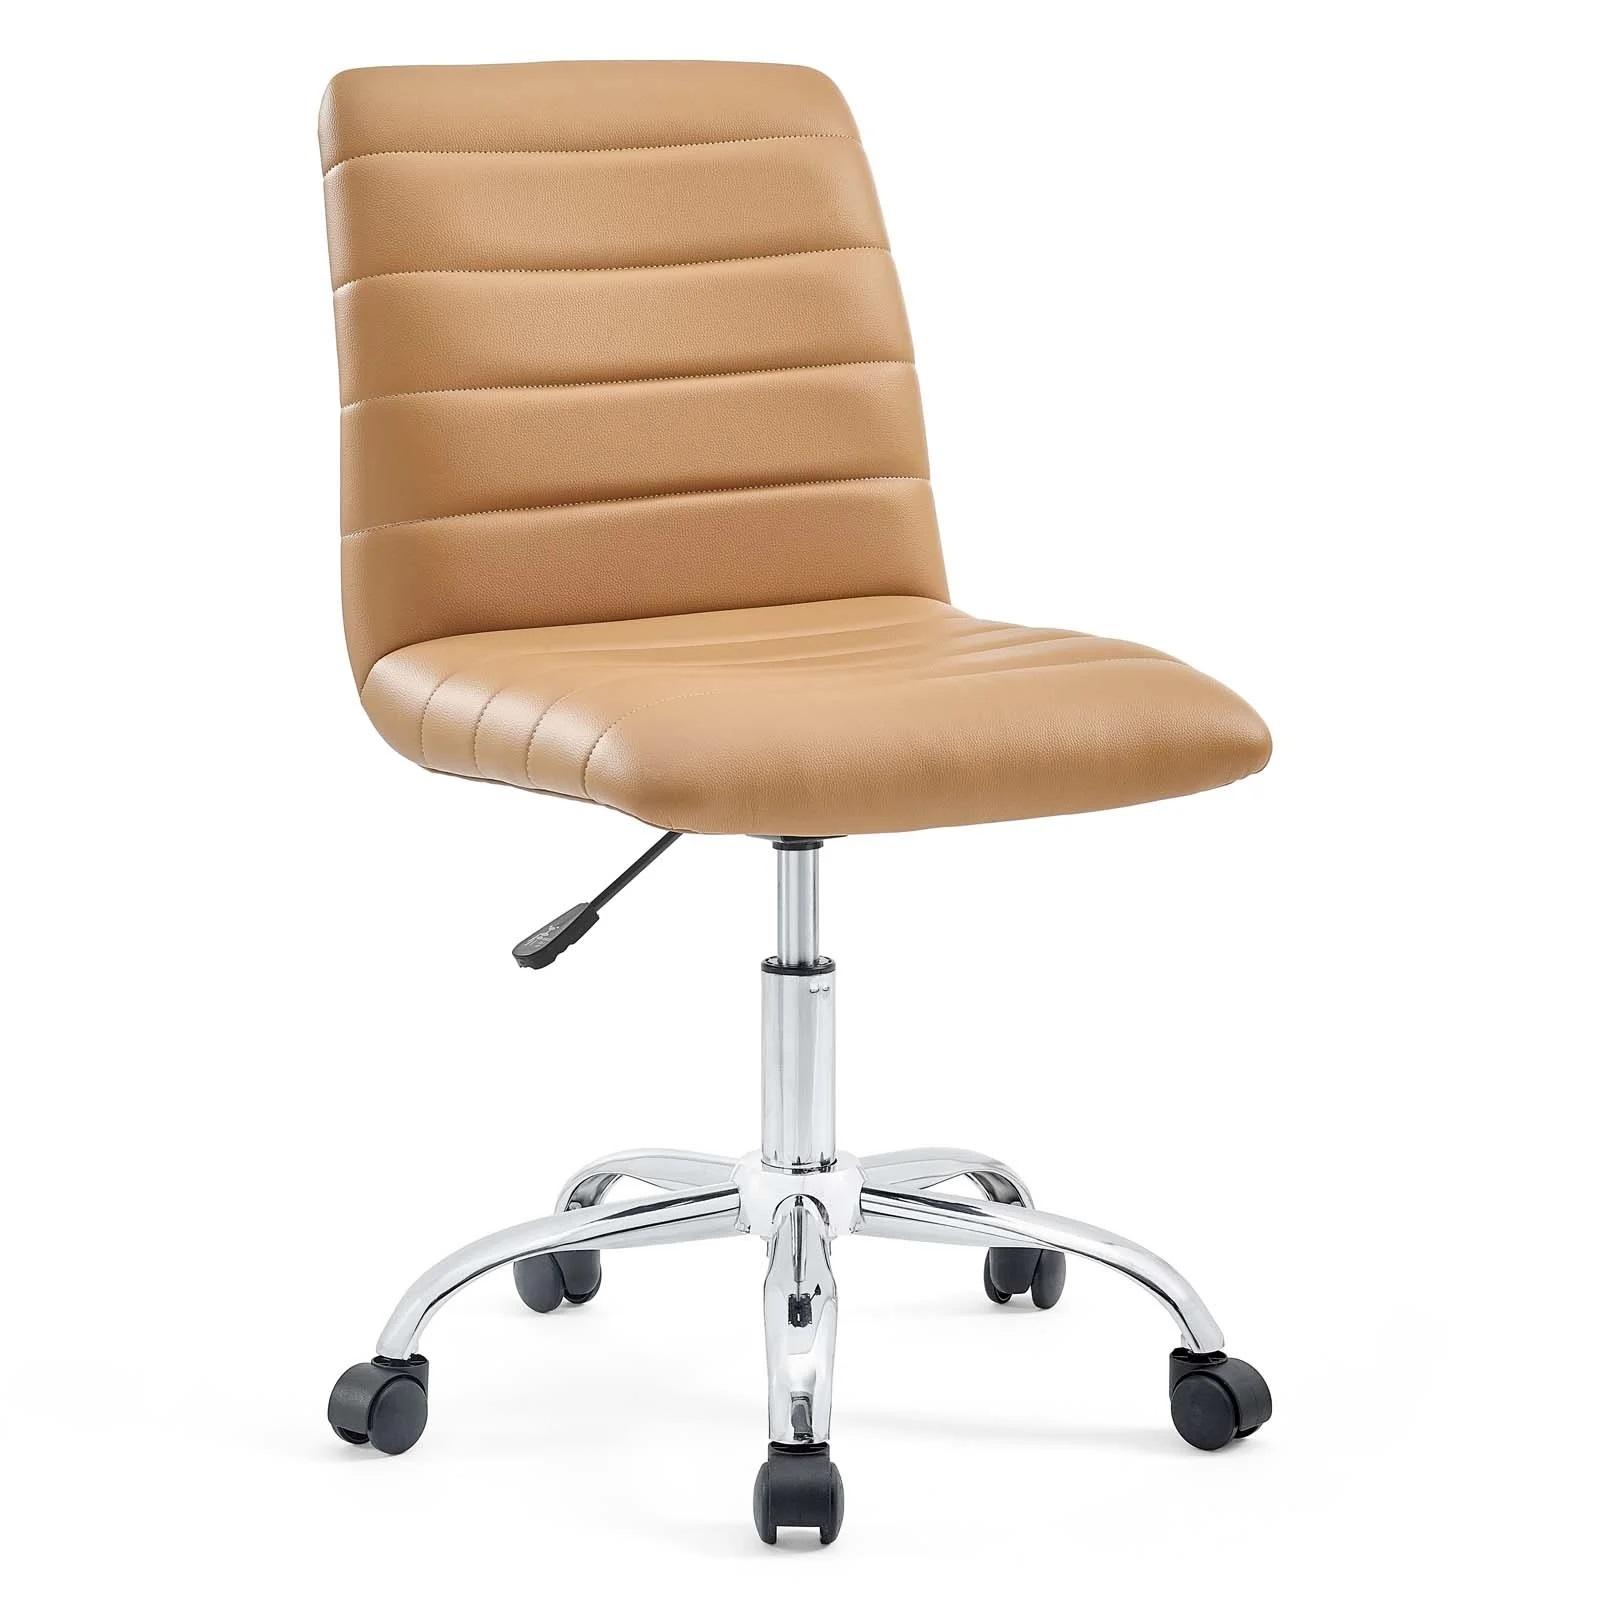 Armless Mid Back Vinyl Office Chair in Tan